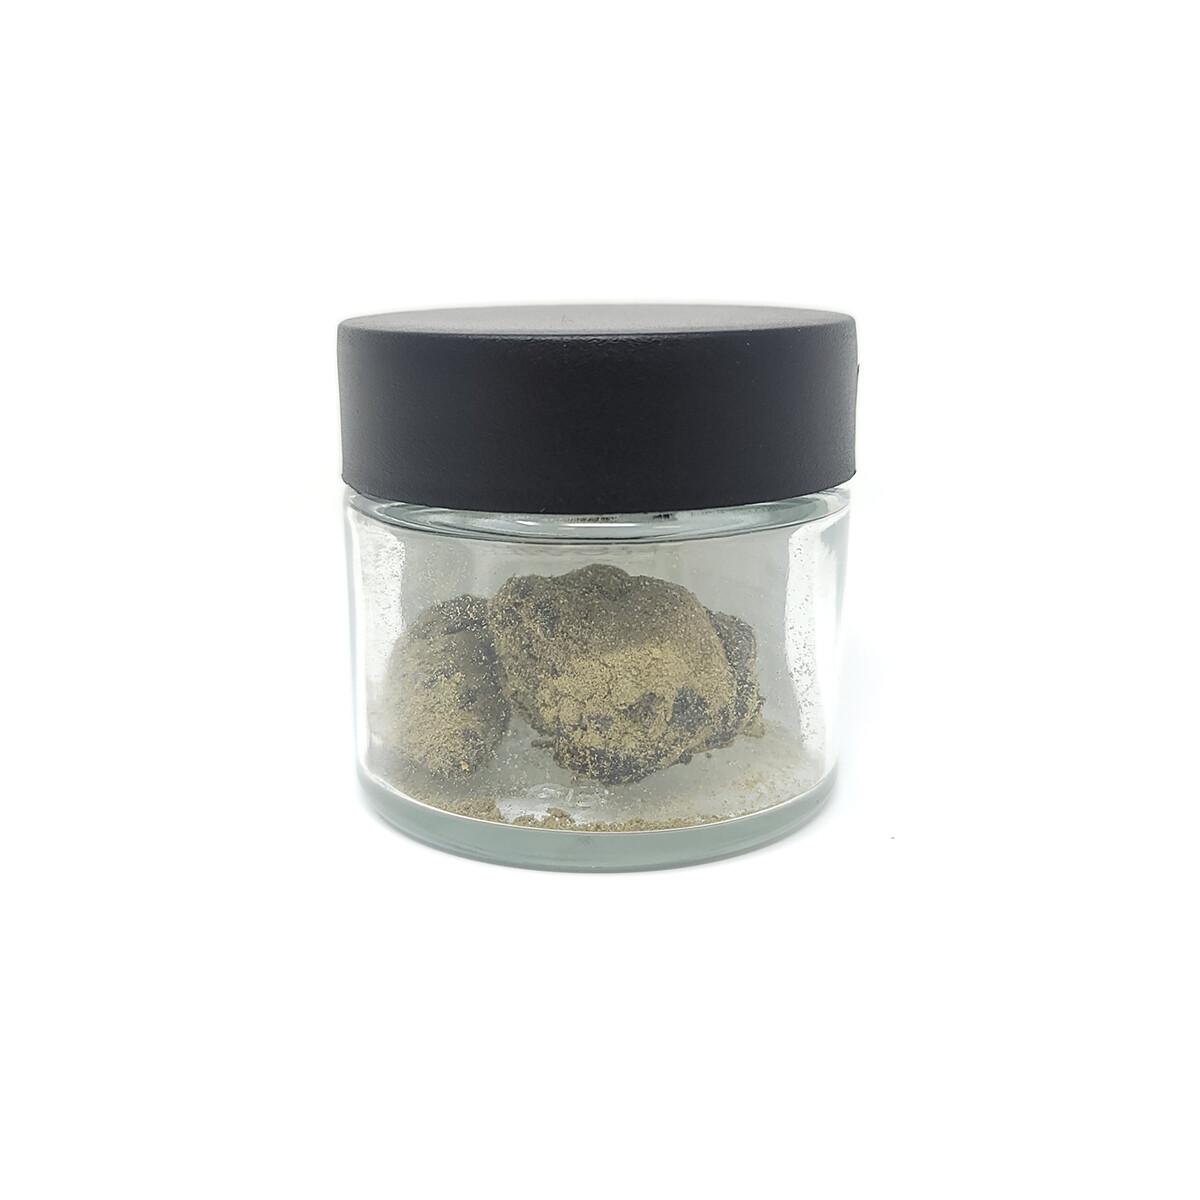 D8 Moonrocks, 2 grams